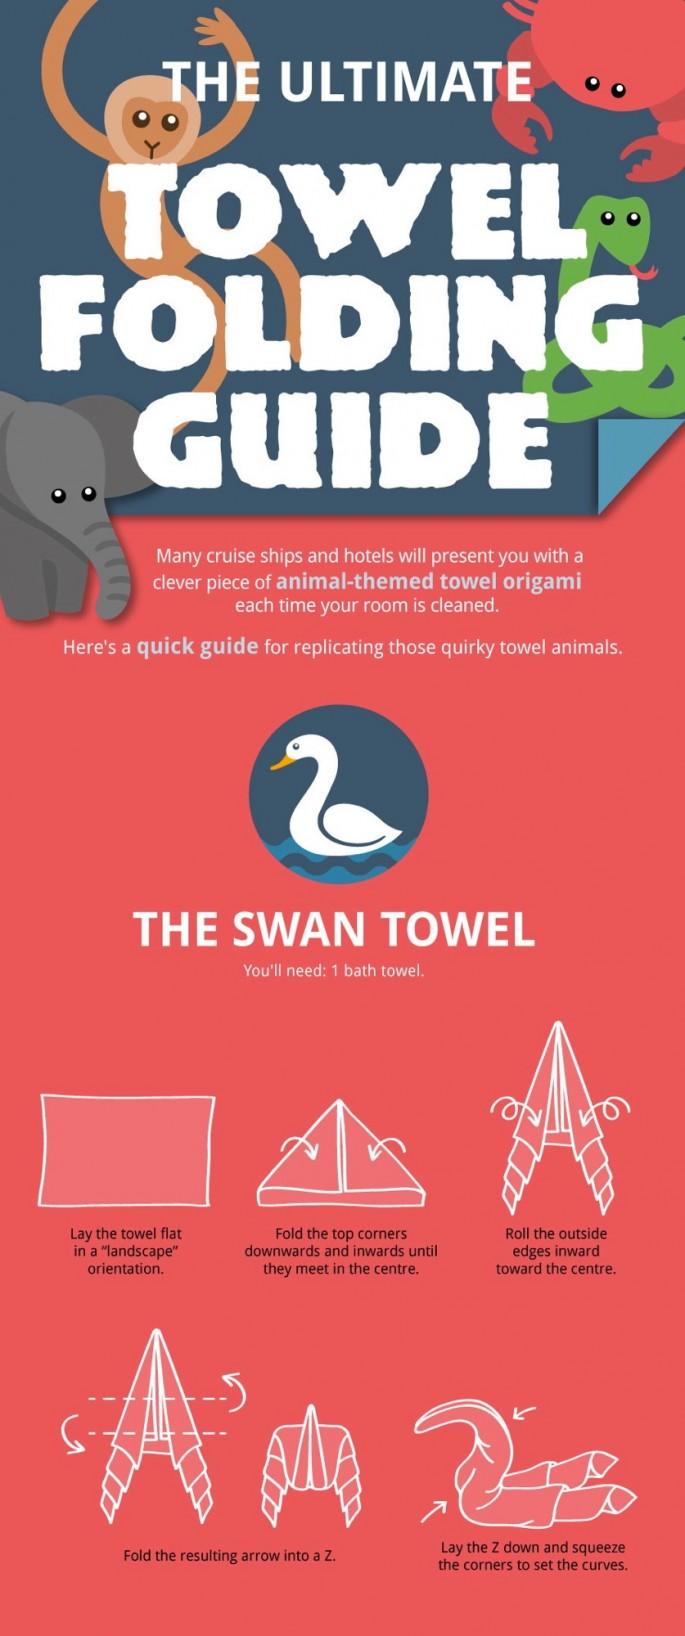 Make laundry day a bit more interesting how to fold towel how to fold towel animals 01 jeuxipadfo Choice Image